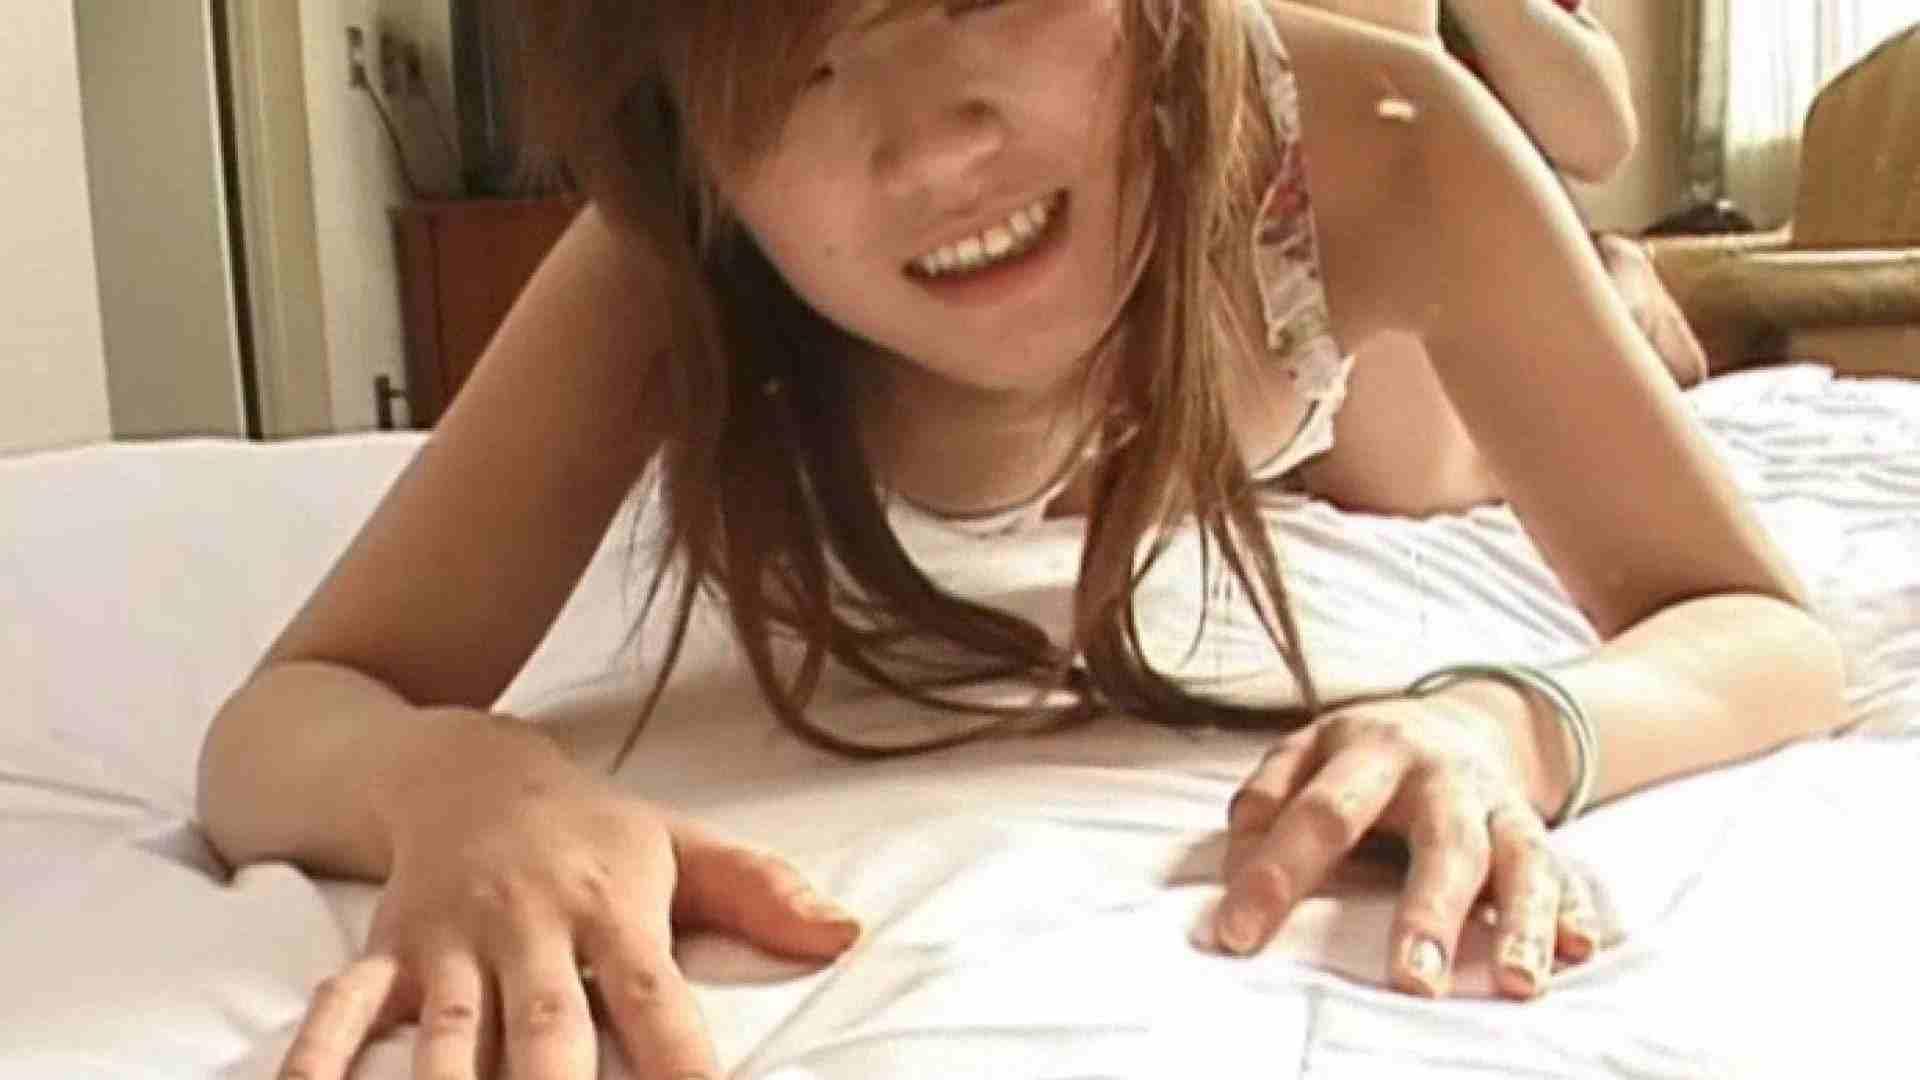 S級厳選美女ビッチガールVol.53 0 | 0  90画像 65